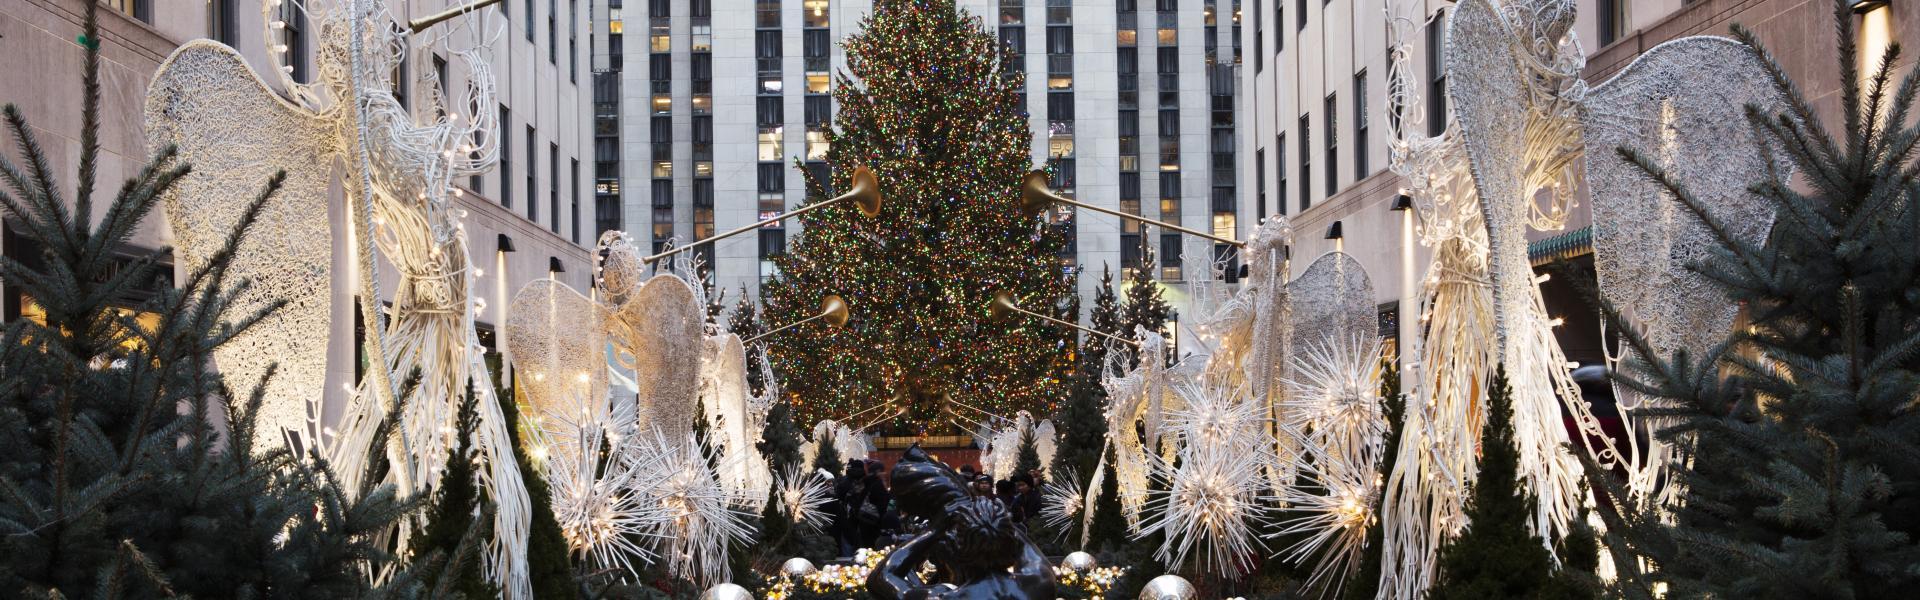 Rockefeller Christmas Tree, Ice Skating, Rockefeller Center, Midtown, NYC, Jen Davis